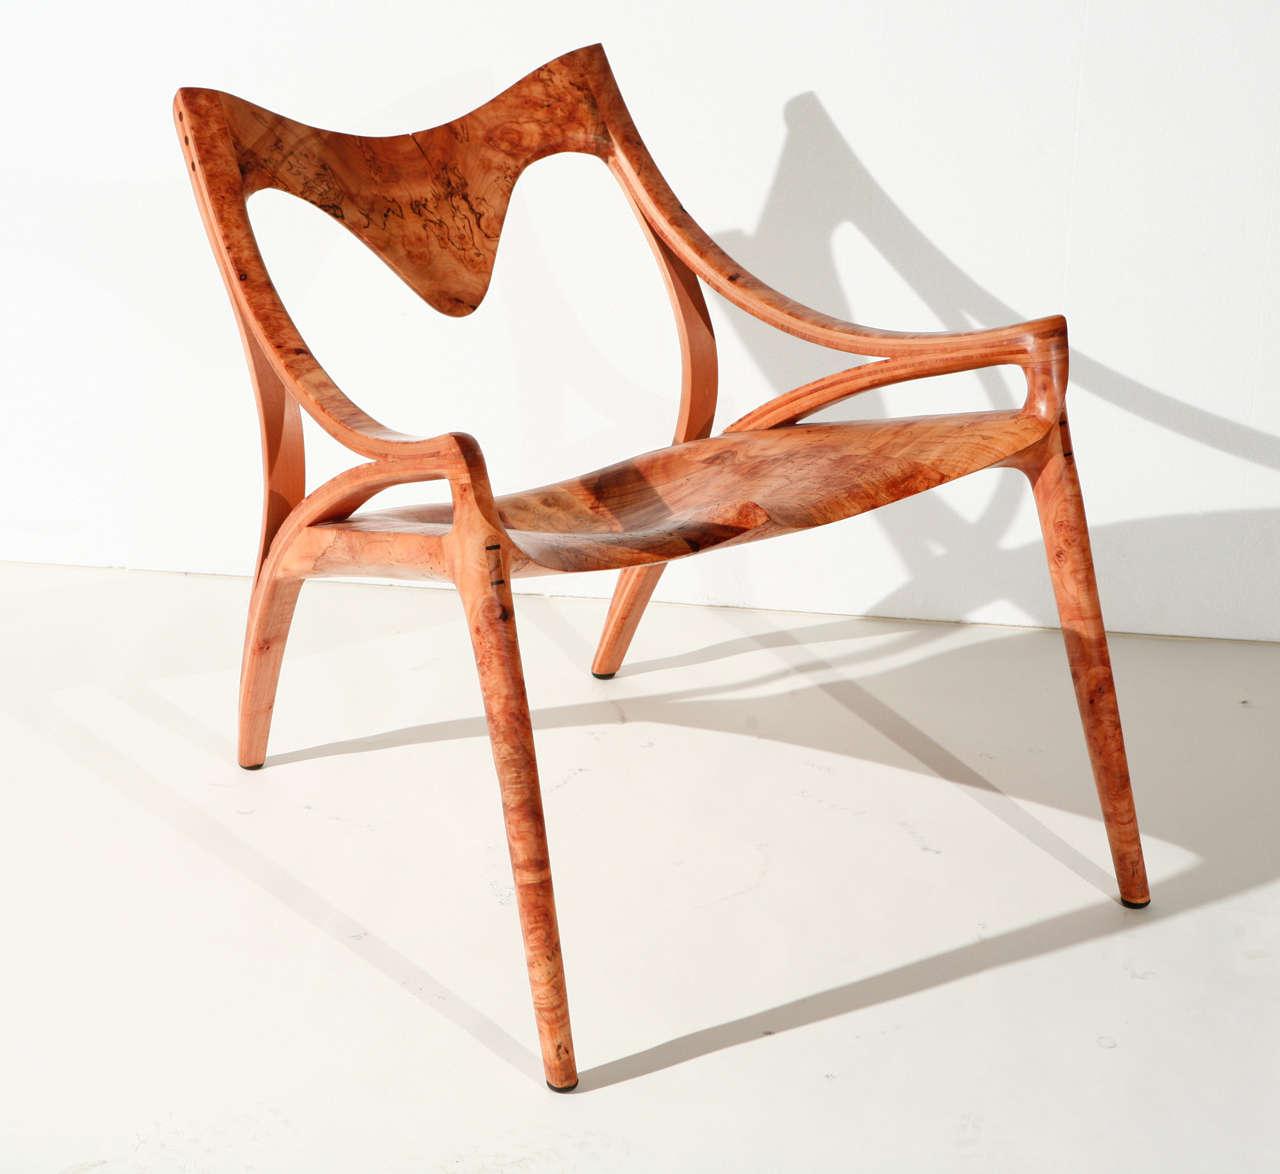 Michael Wilson 'Harley' Chair in maple burl